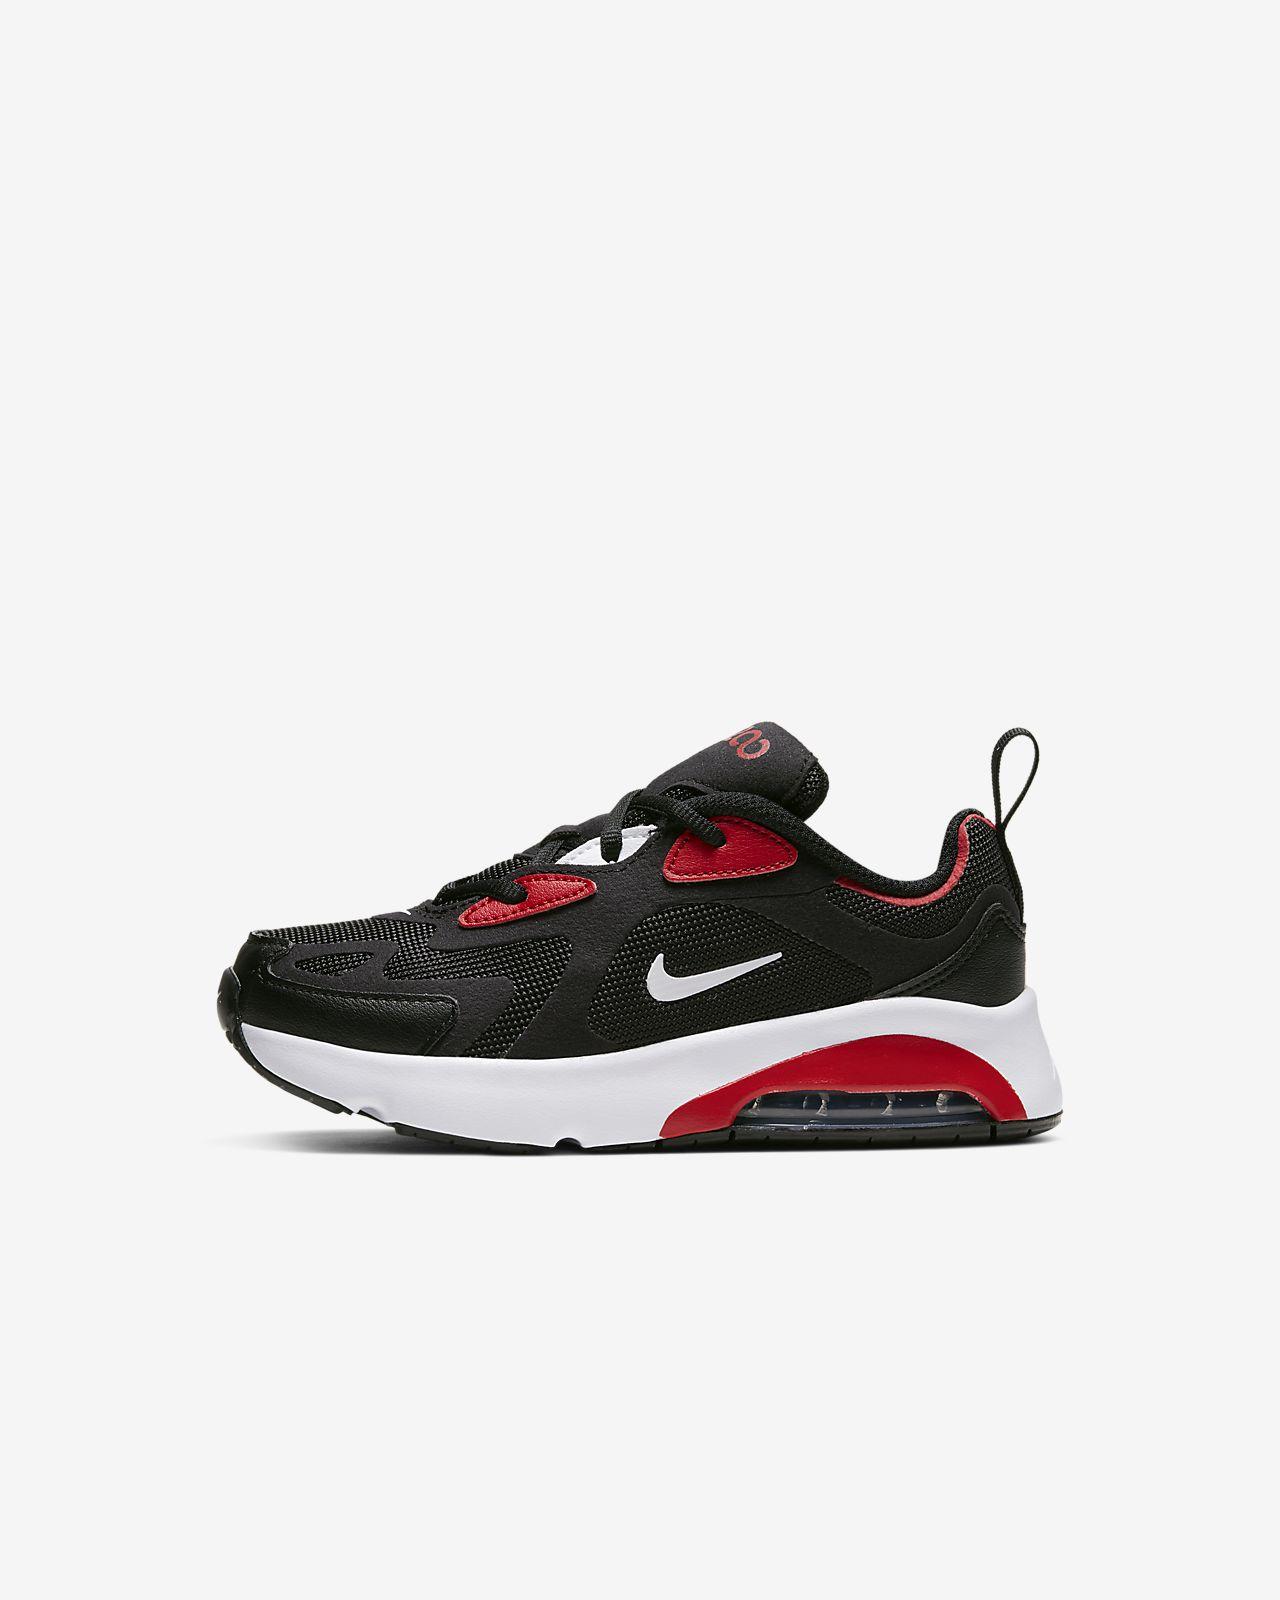 Nike Air Max 90 PS Little Kids´ (10.5c 3y) Nike Sportswear